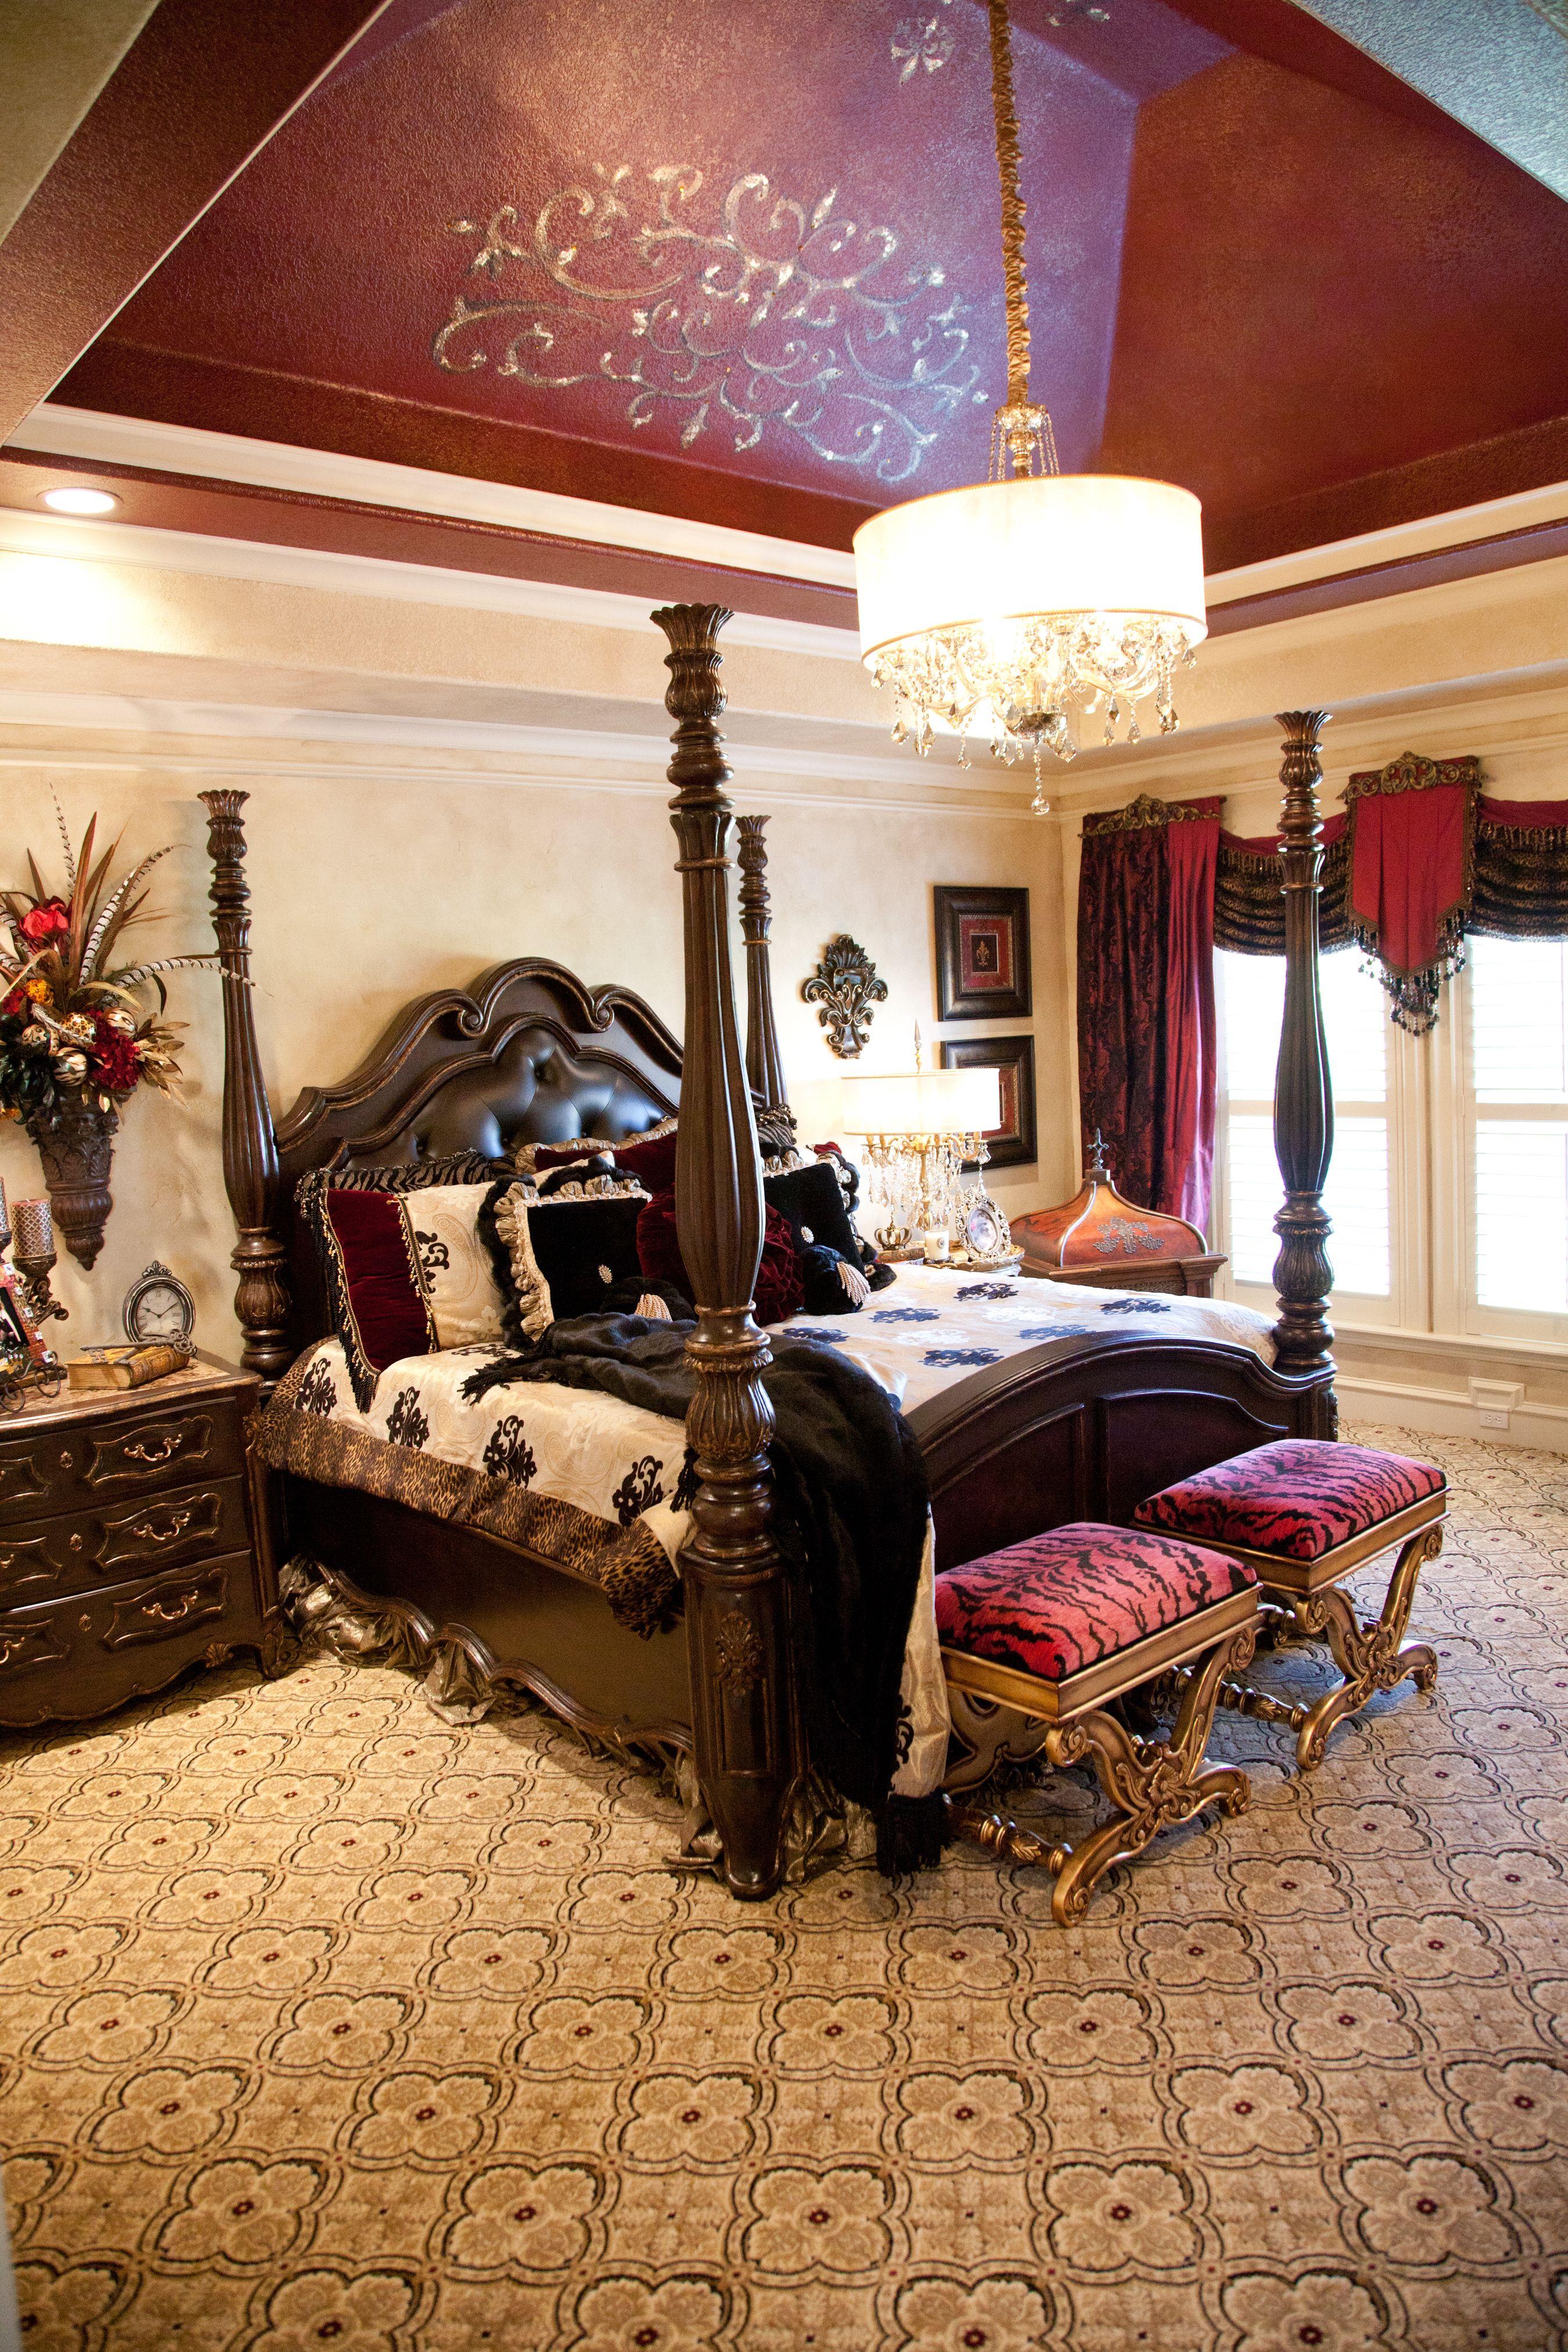 Ceilings This Large Make This #Bedroom Look Twice As Big